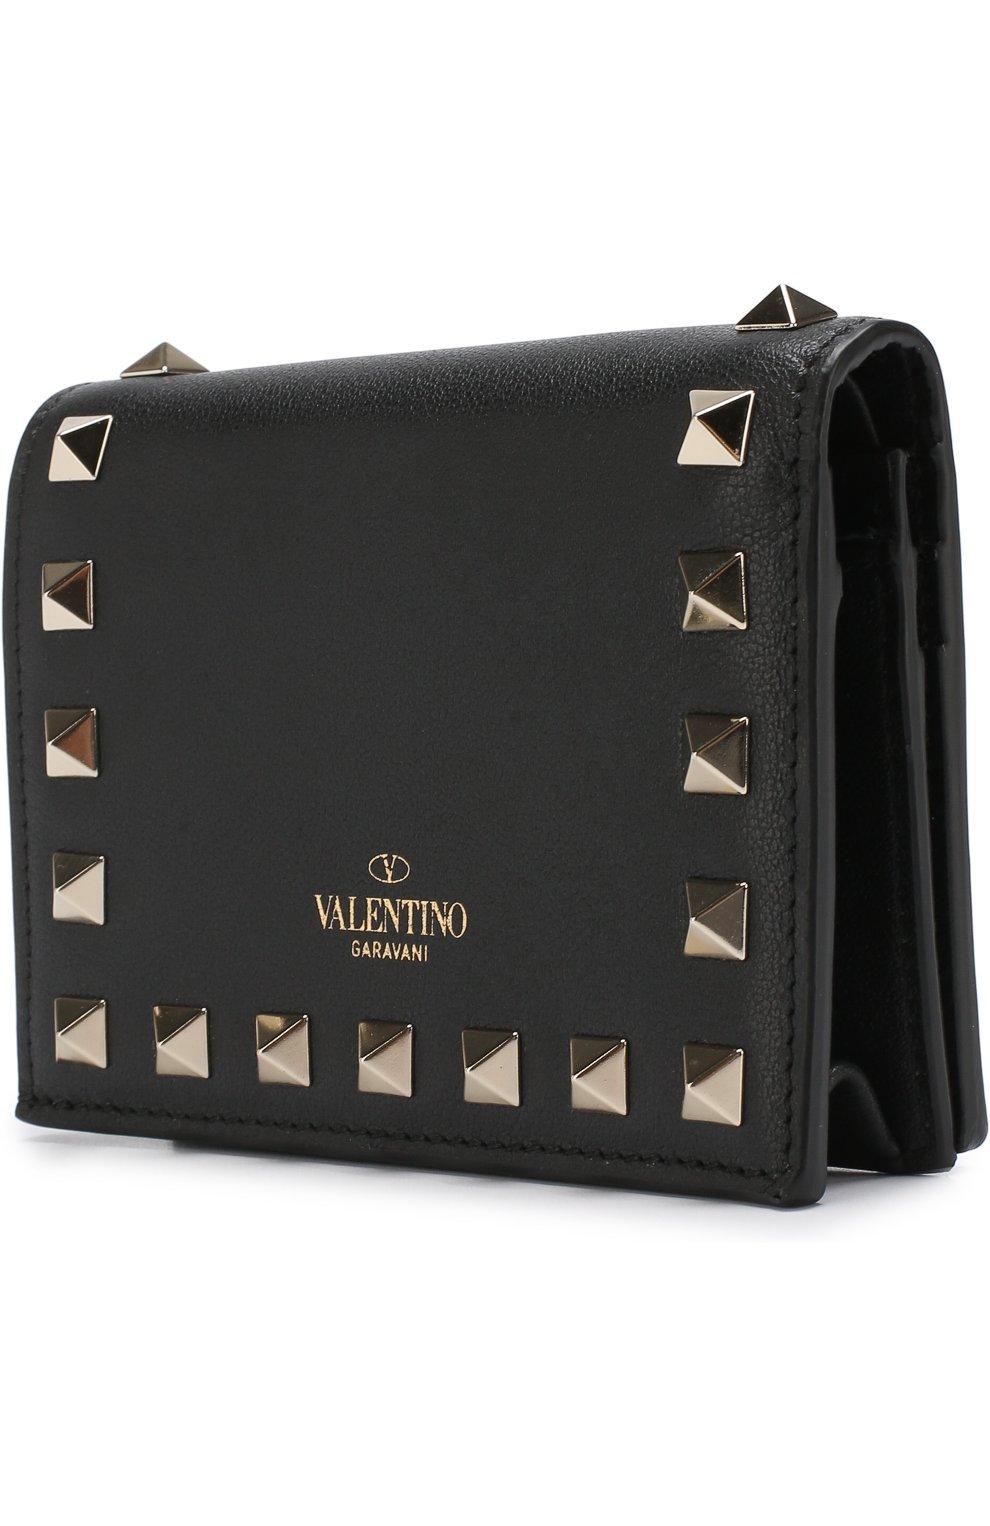 Кожаный кошелек Valentino Garavani Rockstud Valentino черного цвета | Фото №2